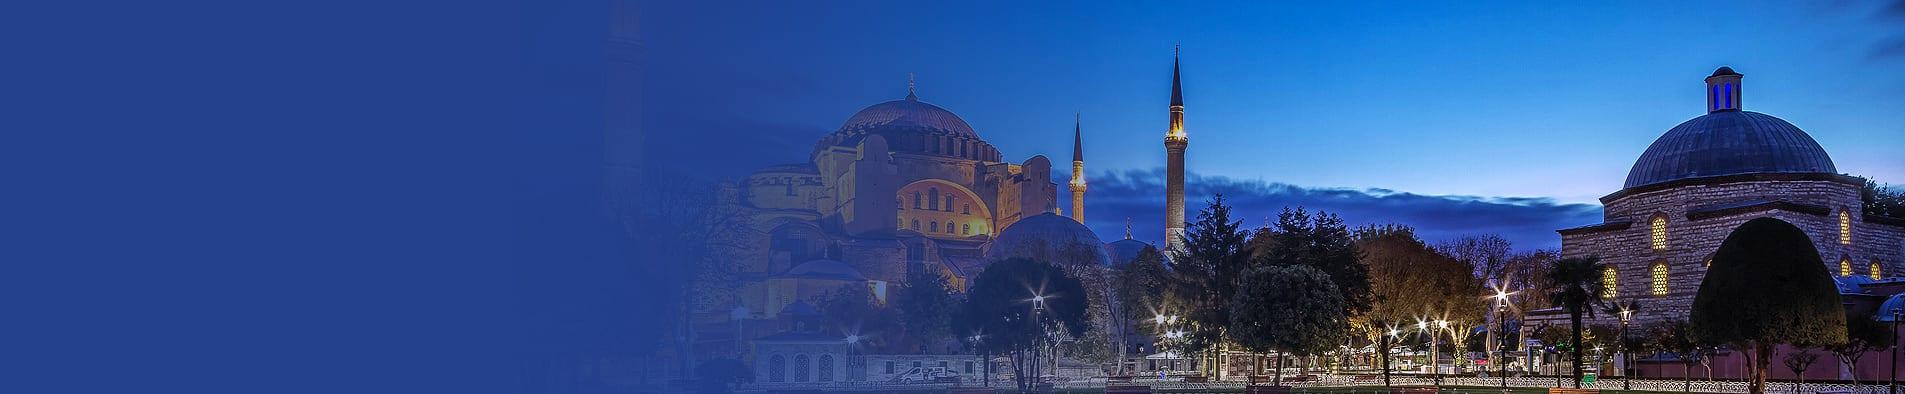 Turkey Country Hub Header